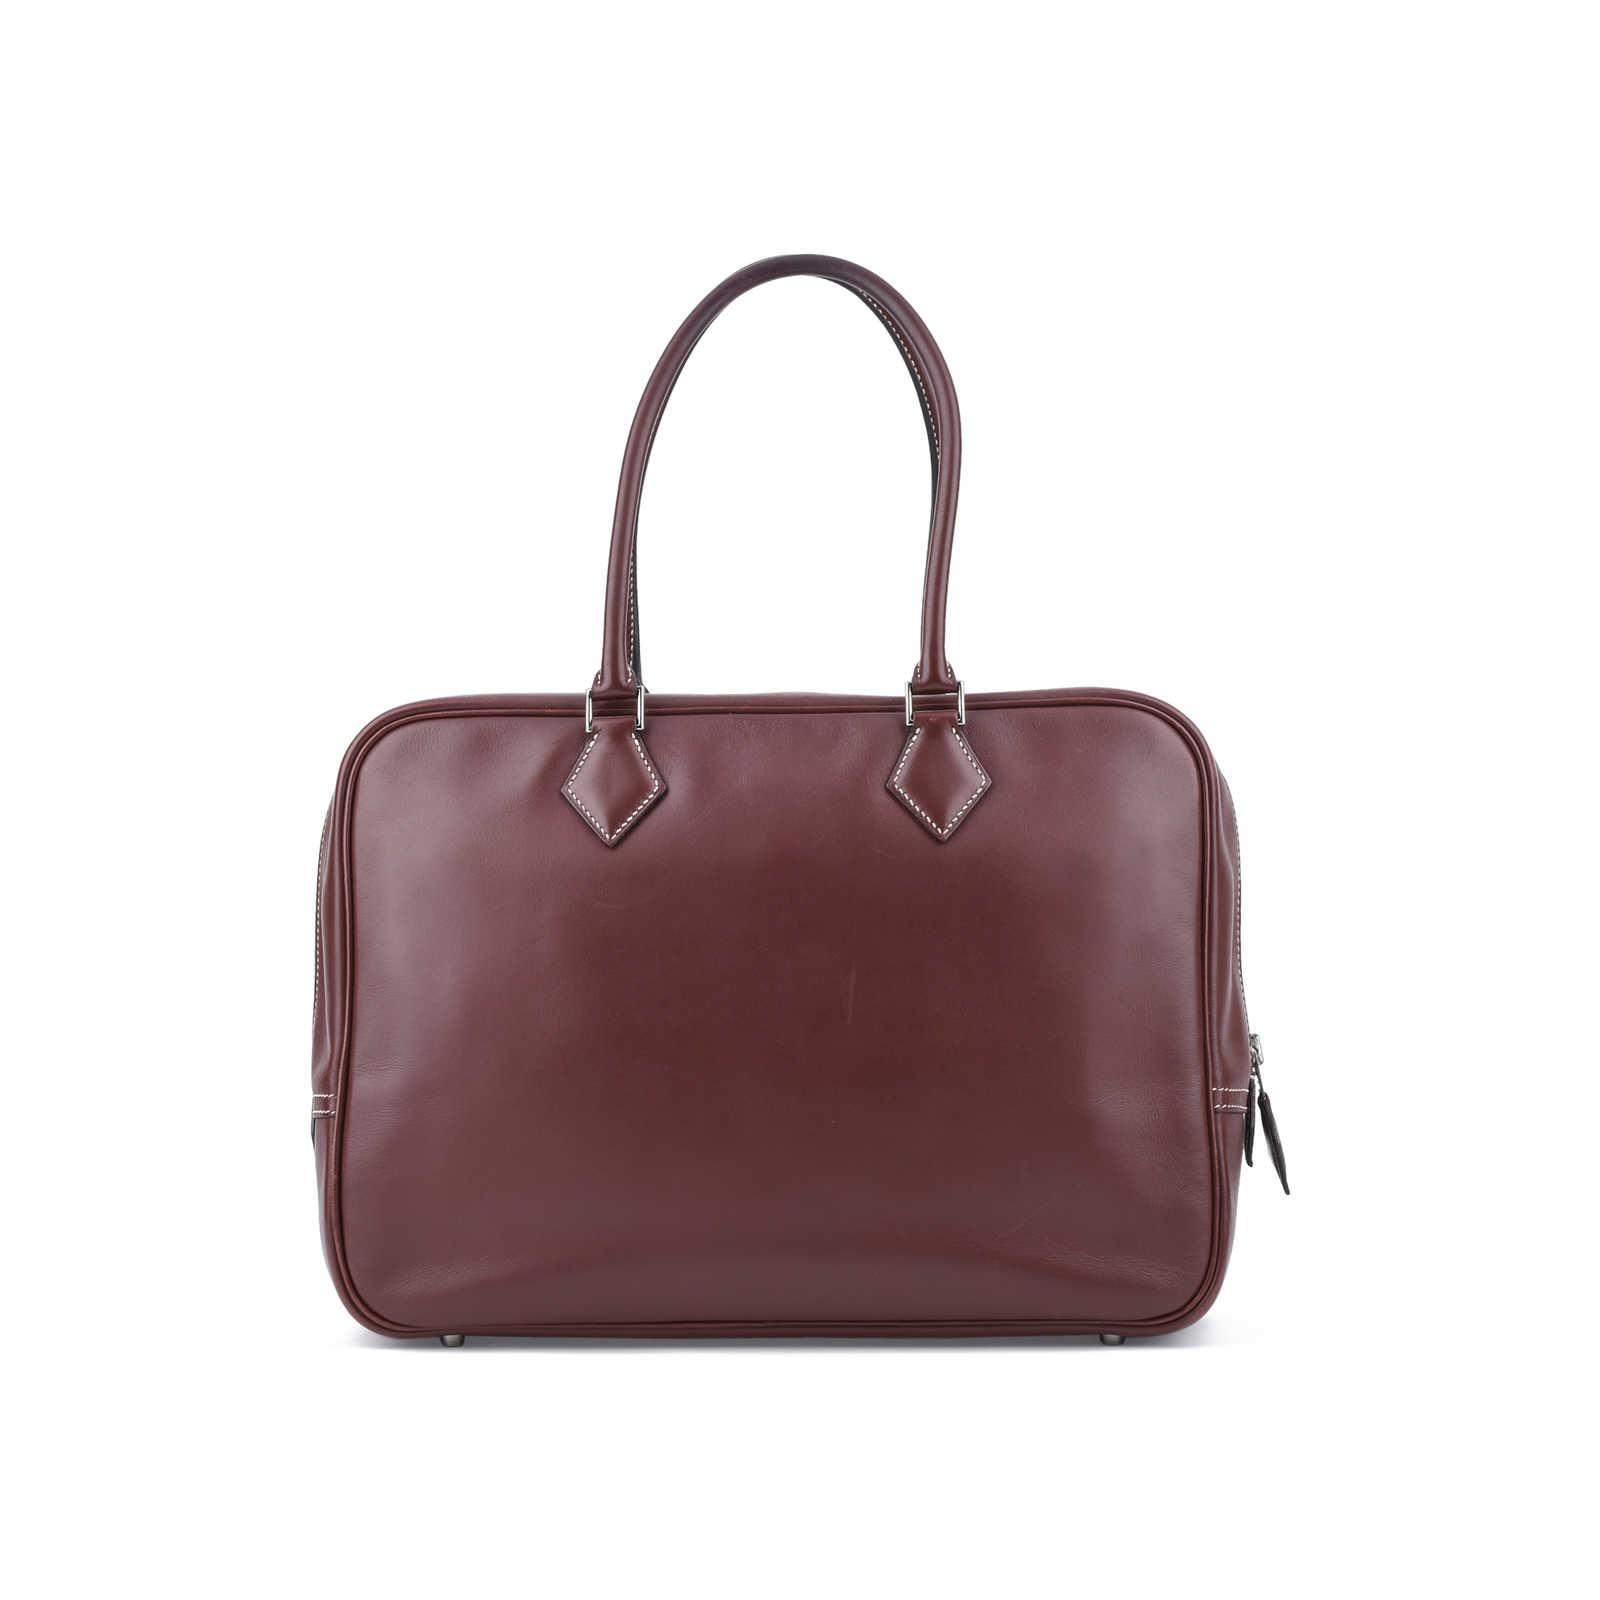 7073342b1f ... Authentic Second Hand Hermès Plume 32 Bag (PSS-075-00078) - Thumbnail  ...